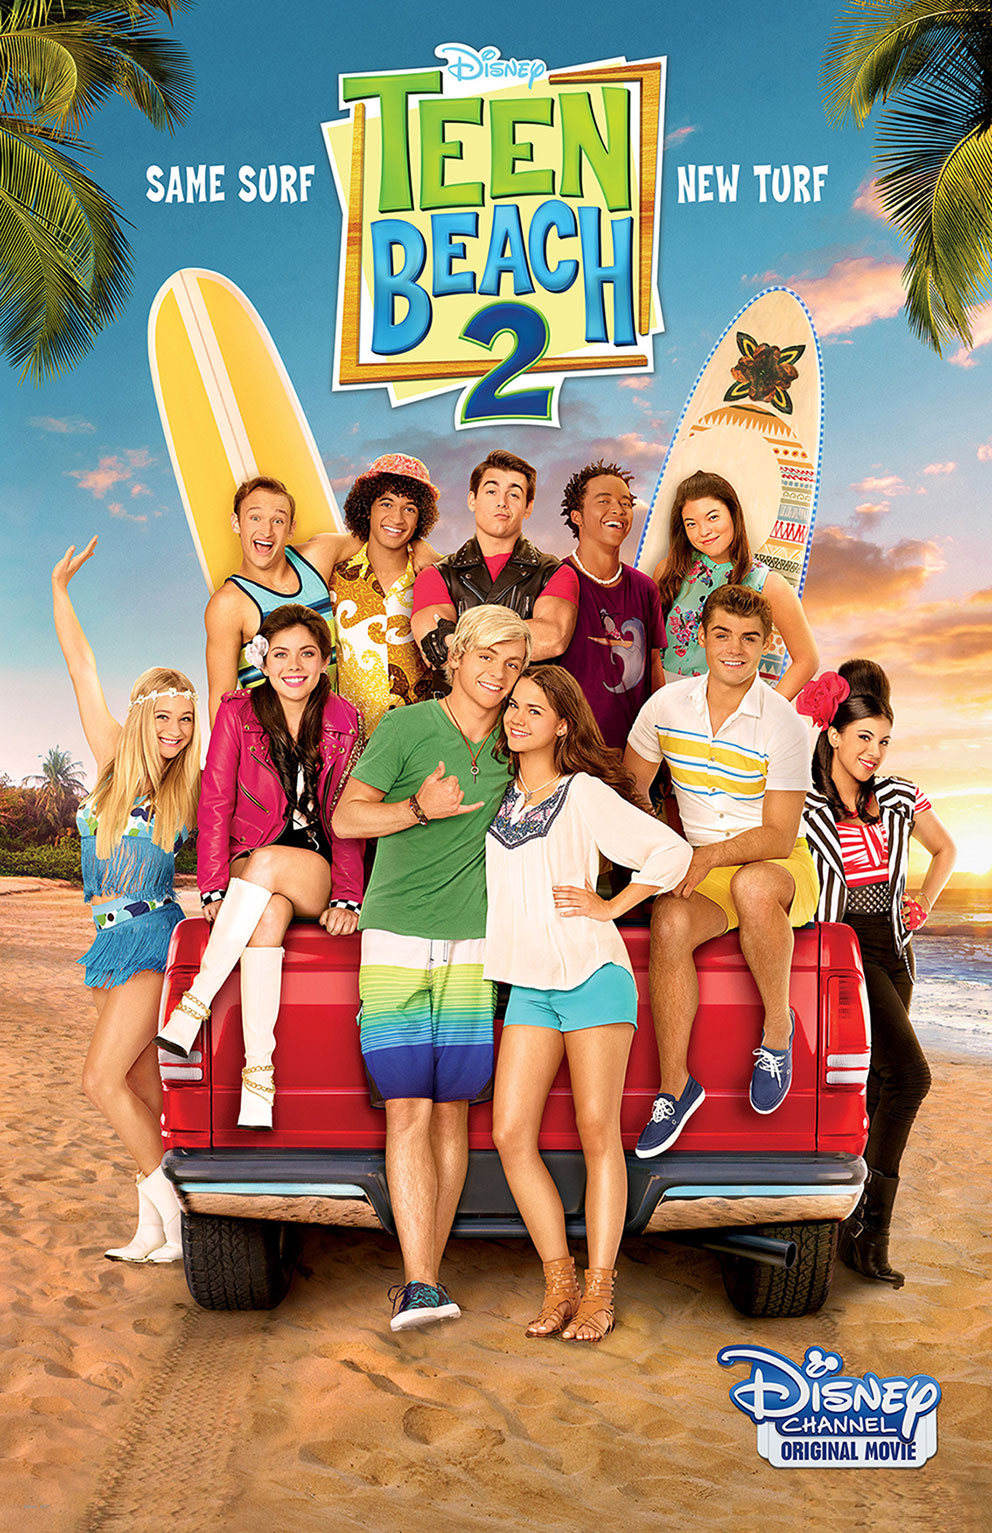 team beach movie 2 full movie free